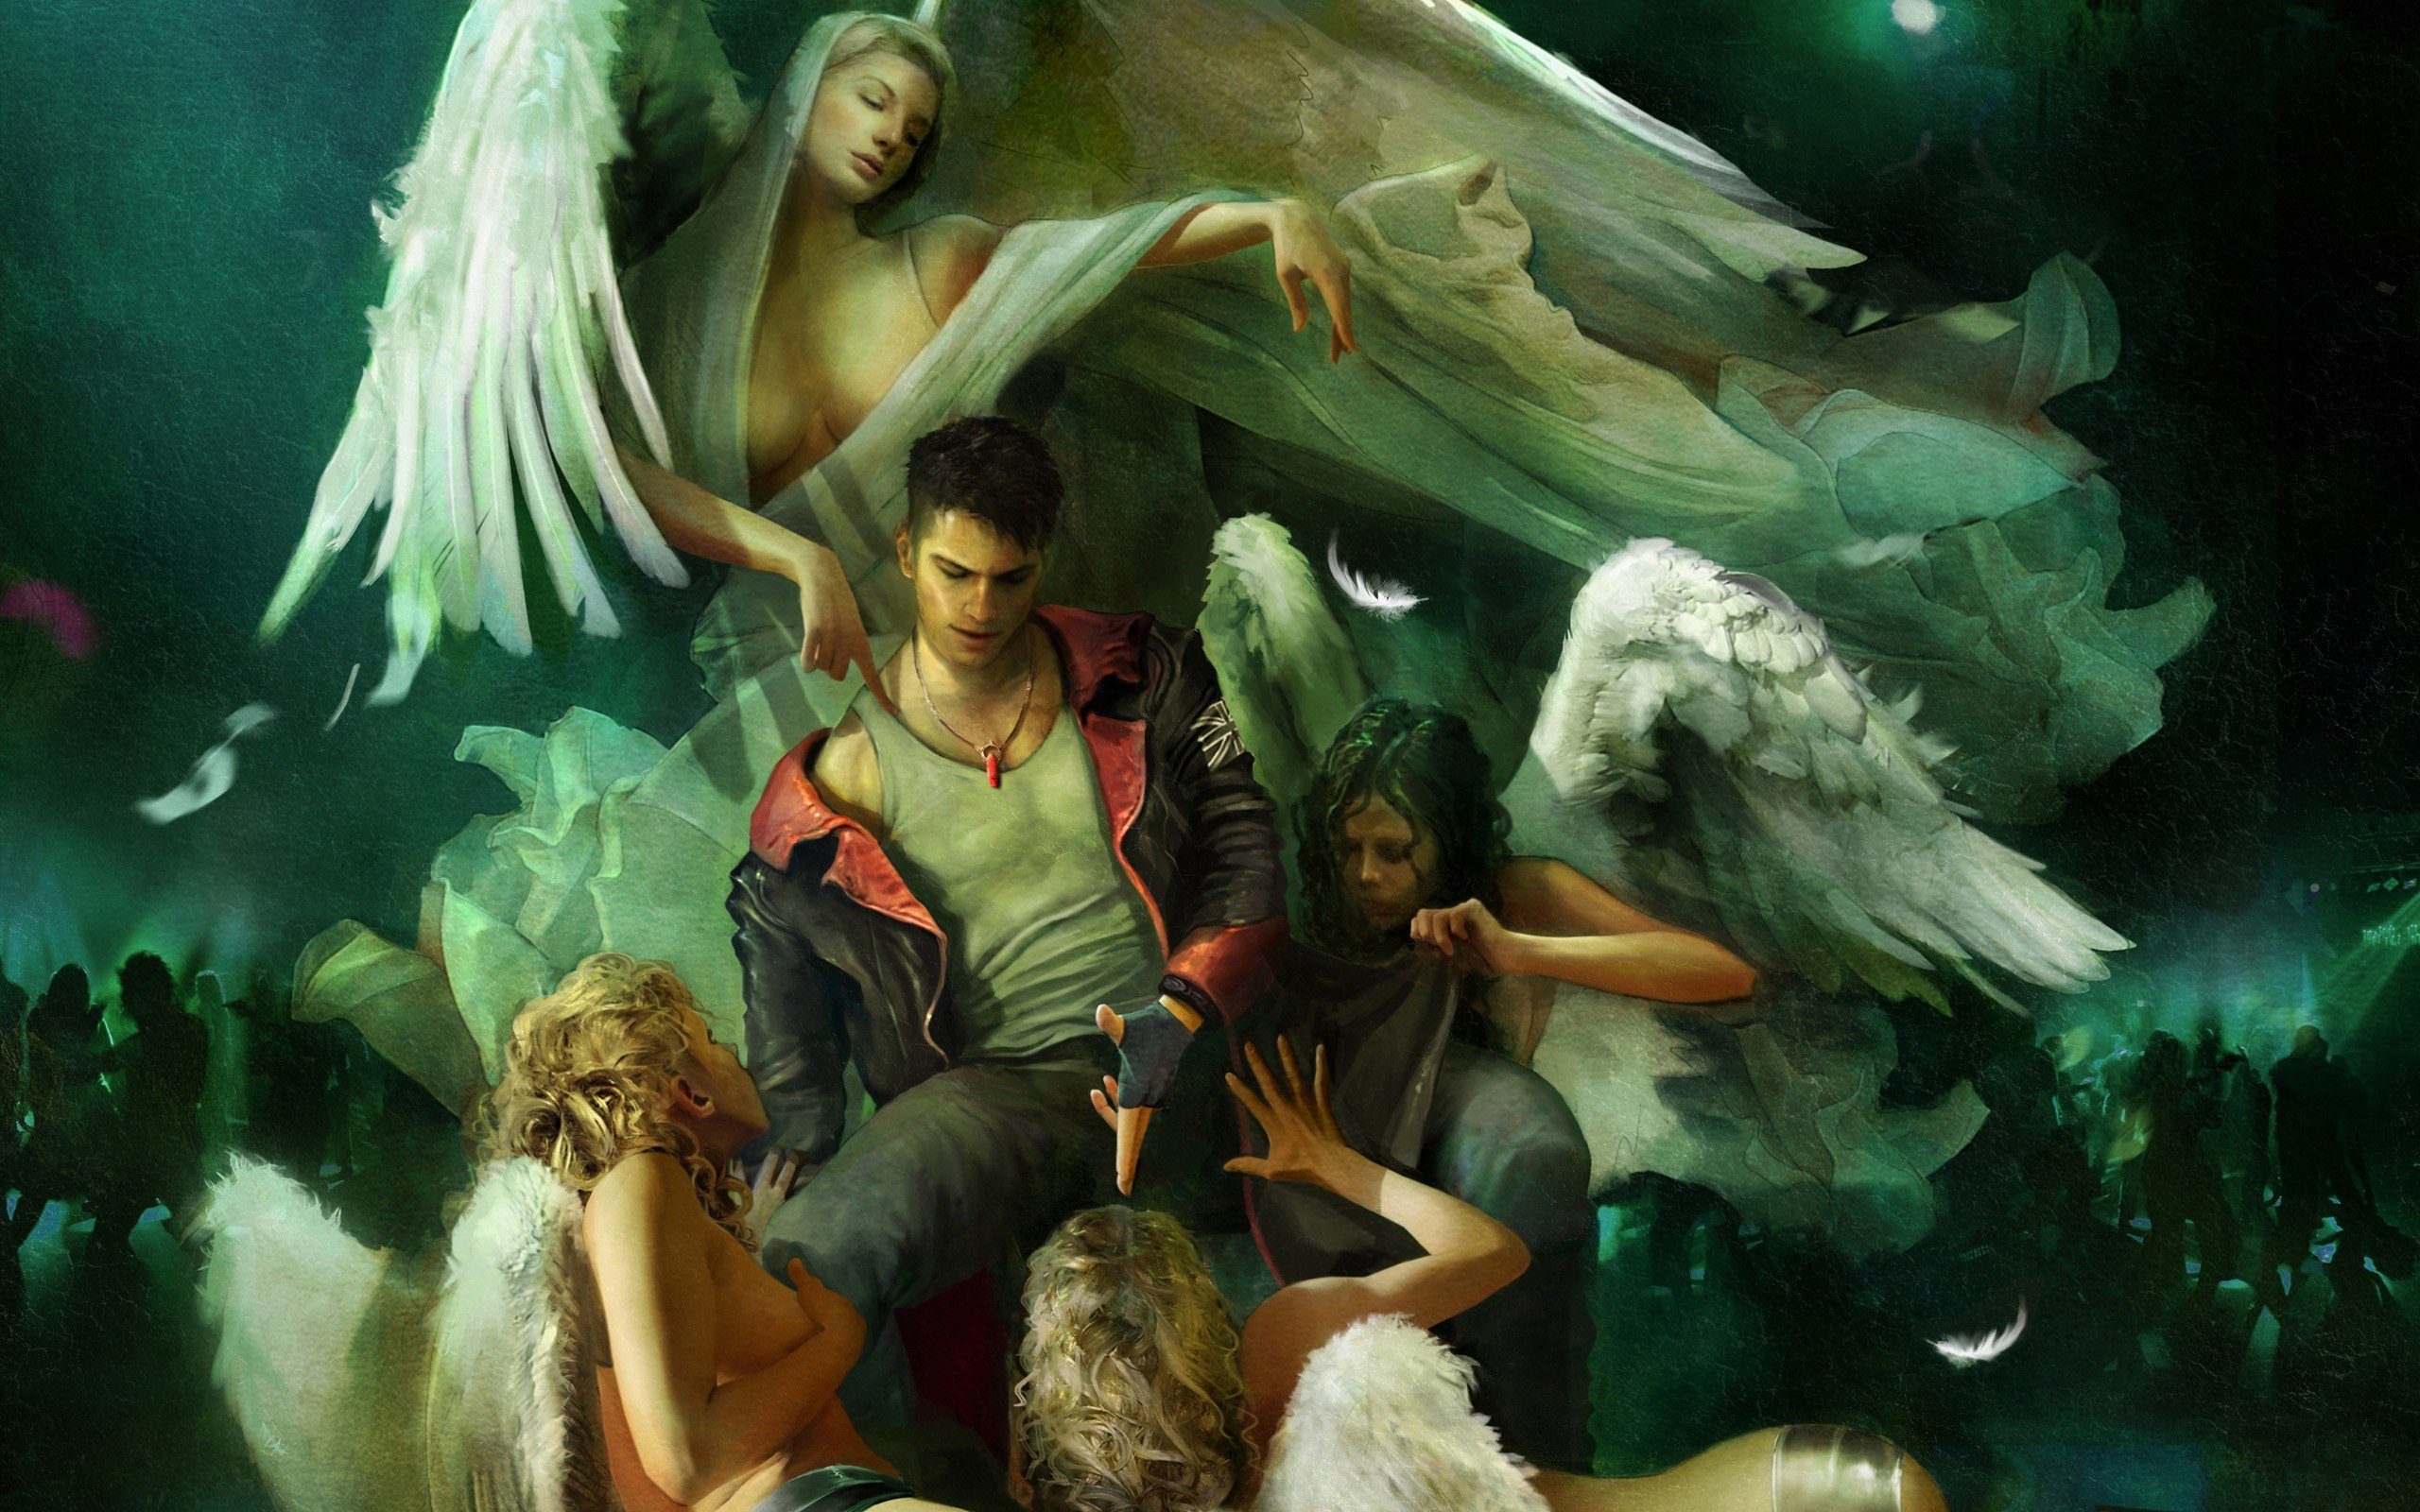 Angels Devil May Cry Vergil Dmc Wallpaper 2560x1600 254647